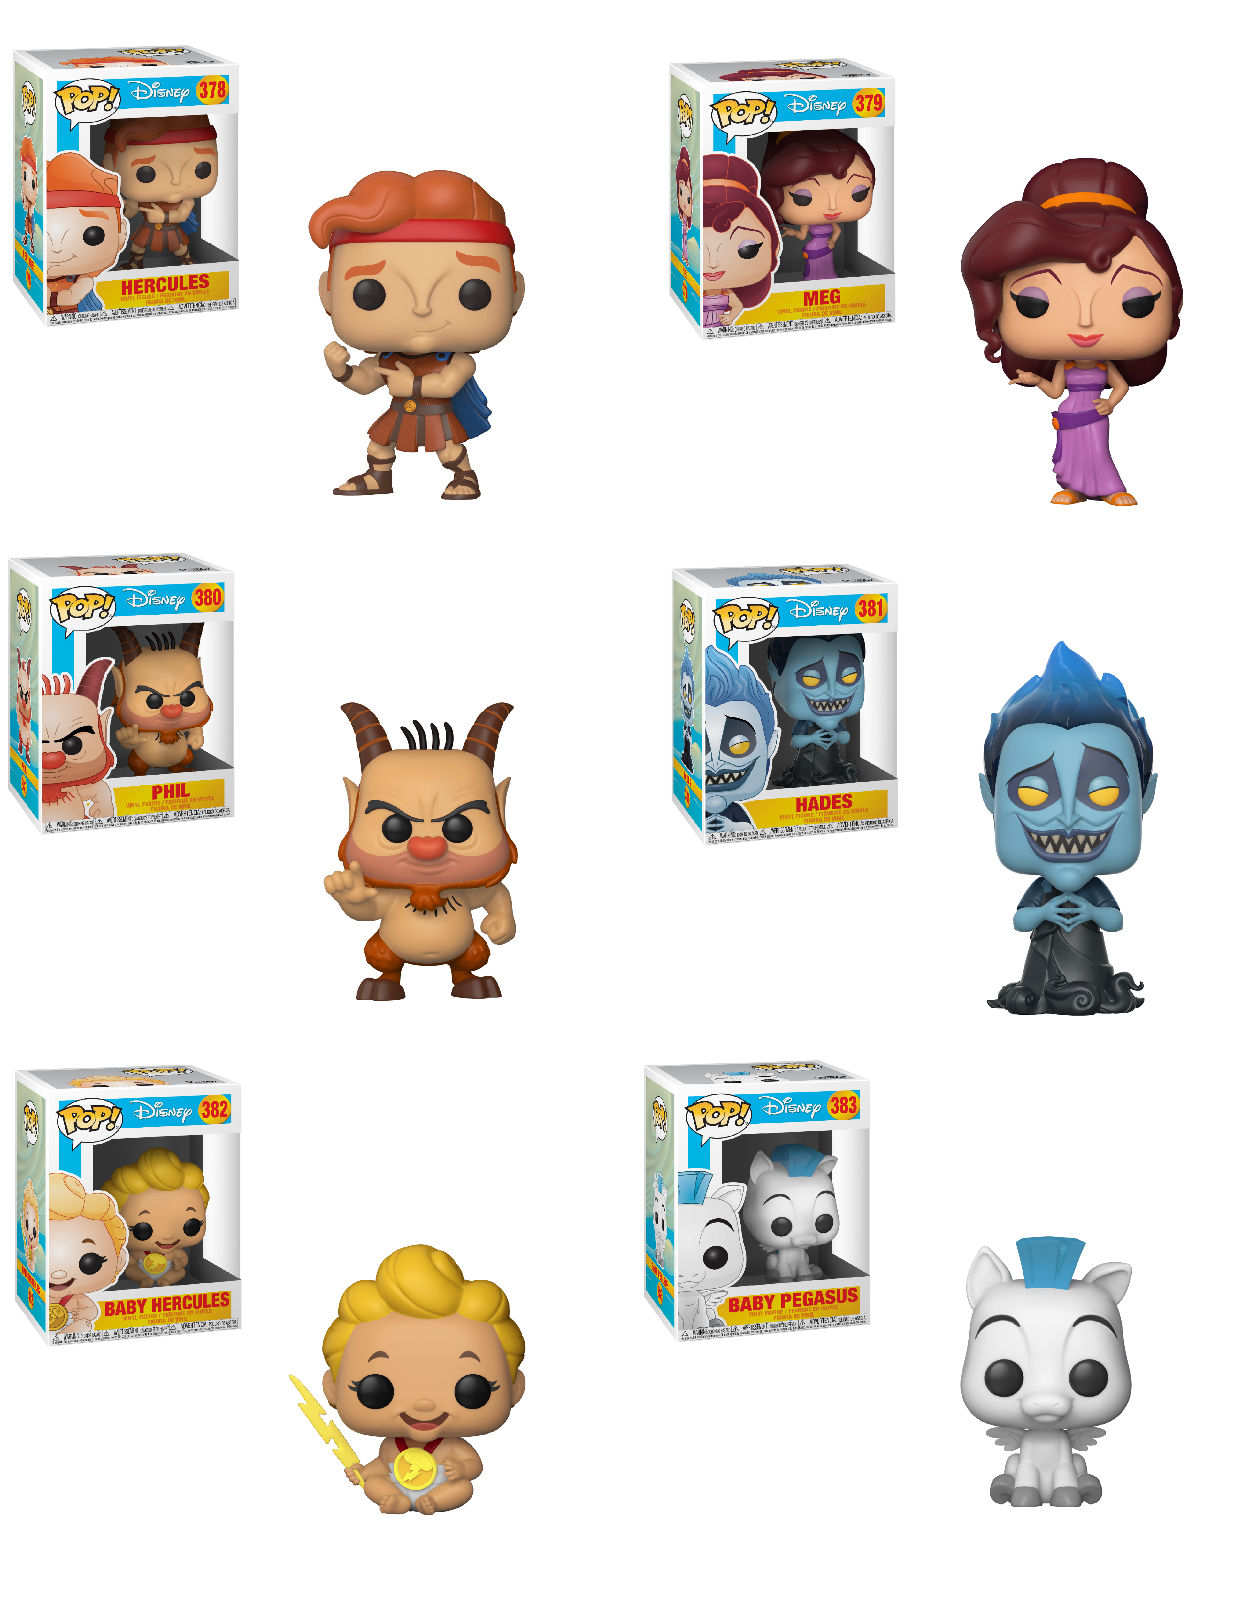 Disney-Meg de Hercules Funko POP Personnage